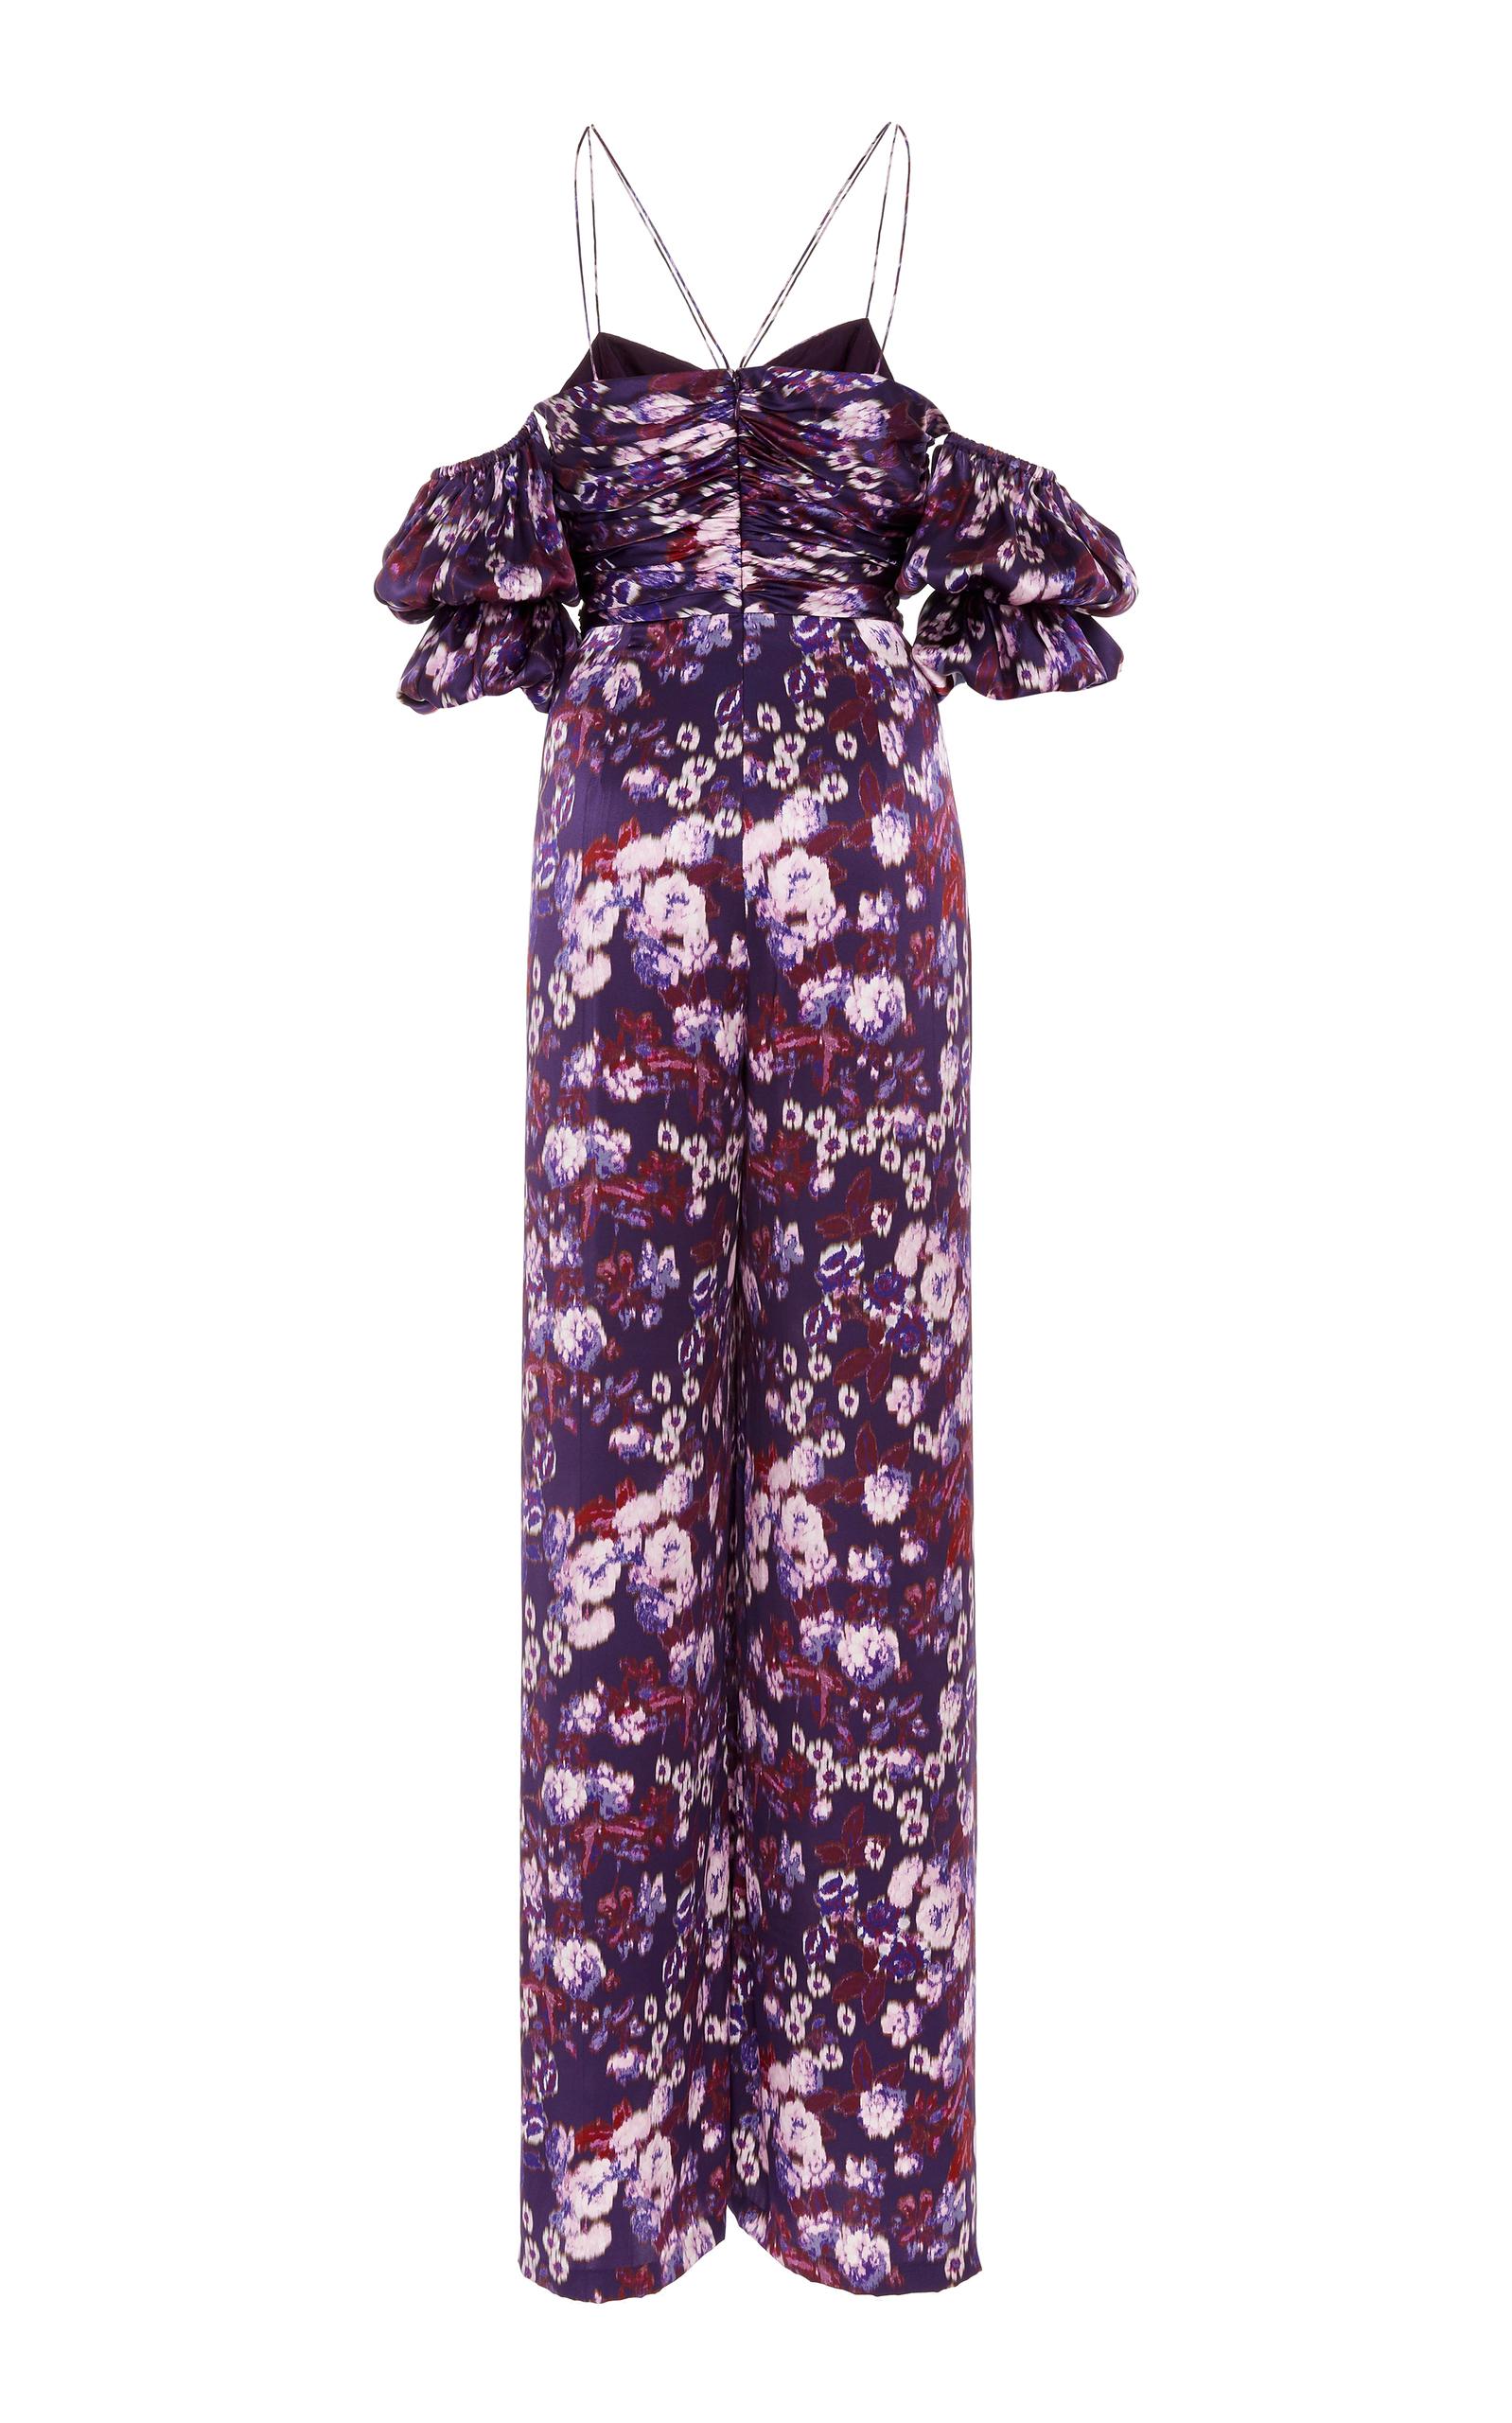 8c66b607ccc AMURAutumn Floral Jumpsuit. CLOSE. Loading. Loading